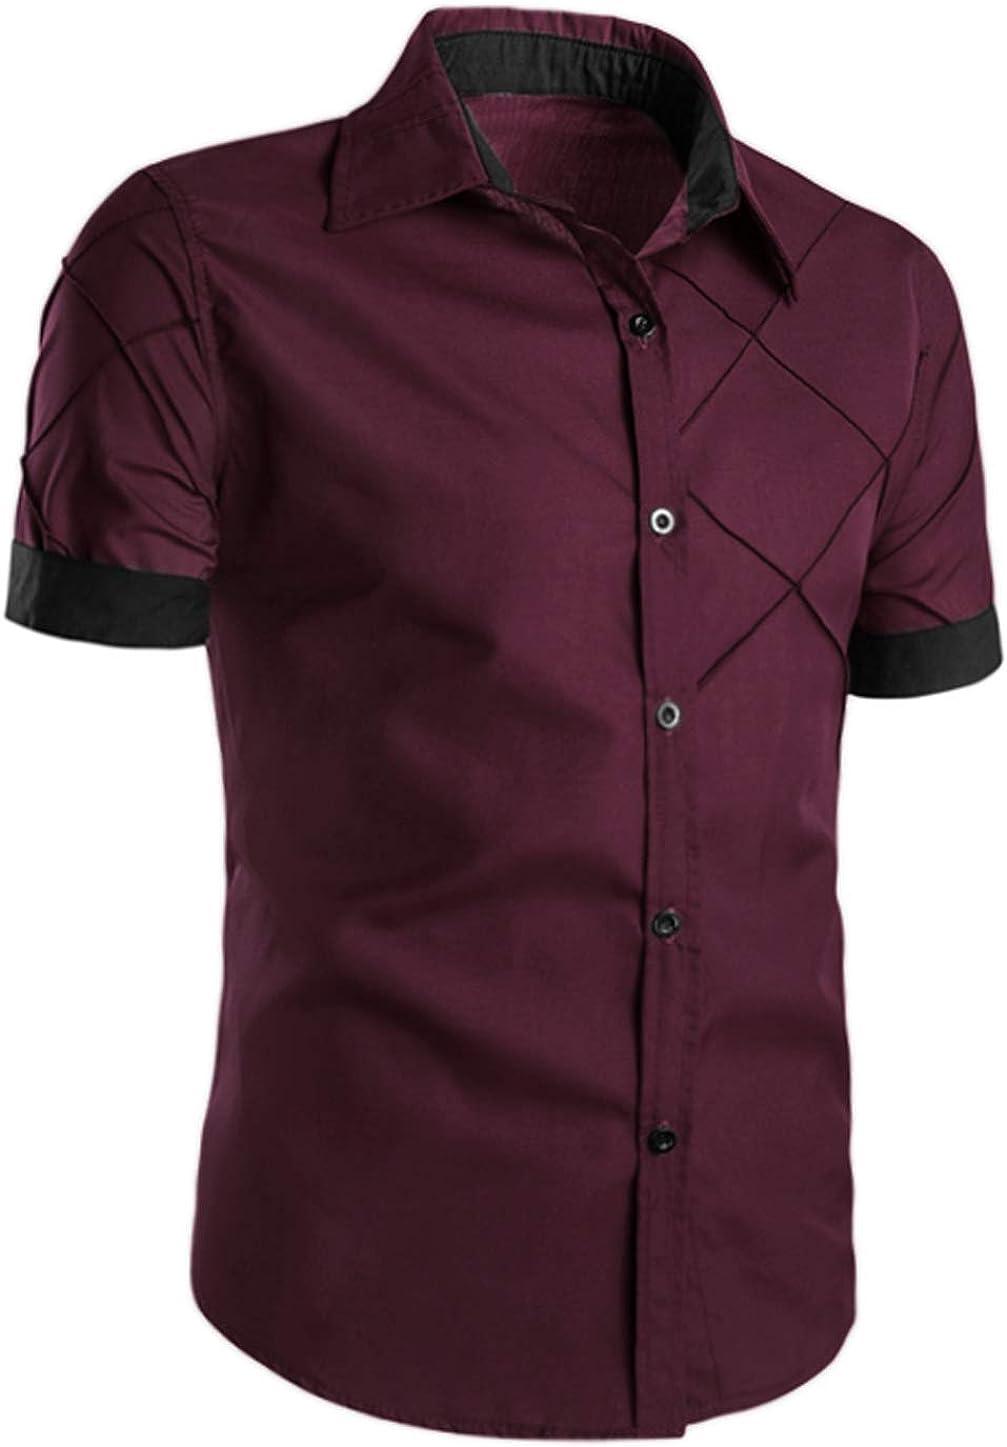 Lars Amadeus Men's Dress Shirt Short Sleeve Button Down Contrast Color Printed Bussiness Casual Shirt